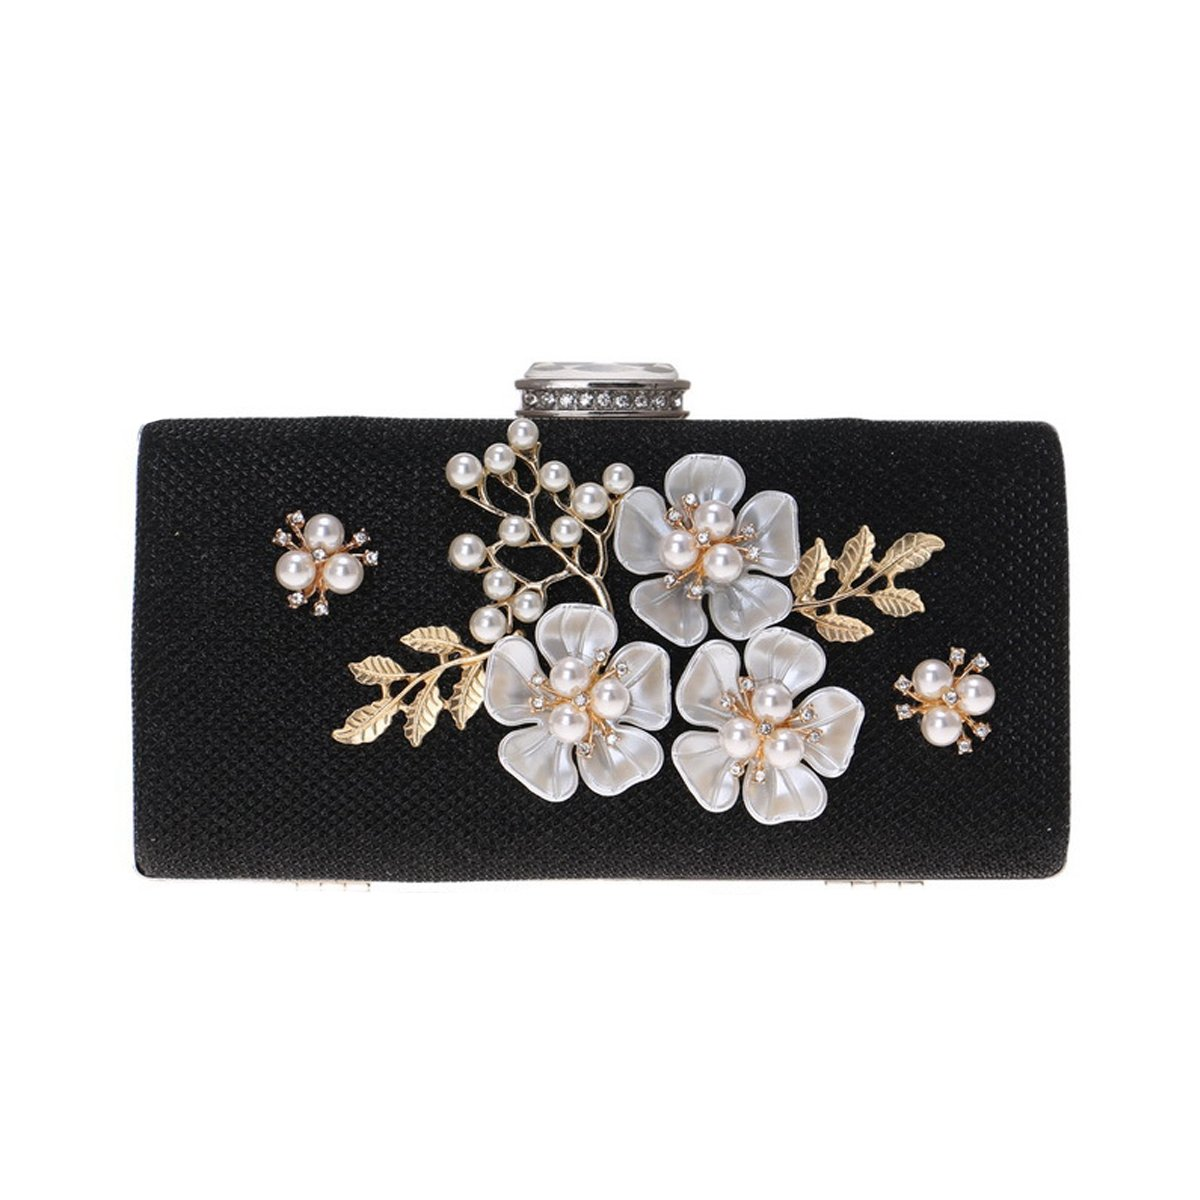 Black Flada Women's Flower Evening Handbag Clutch Pearl Beaded Elegant Hard Evening Purse